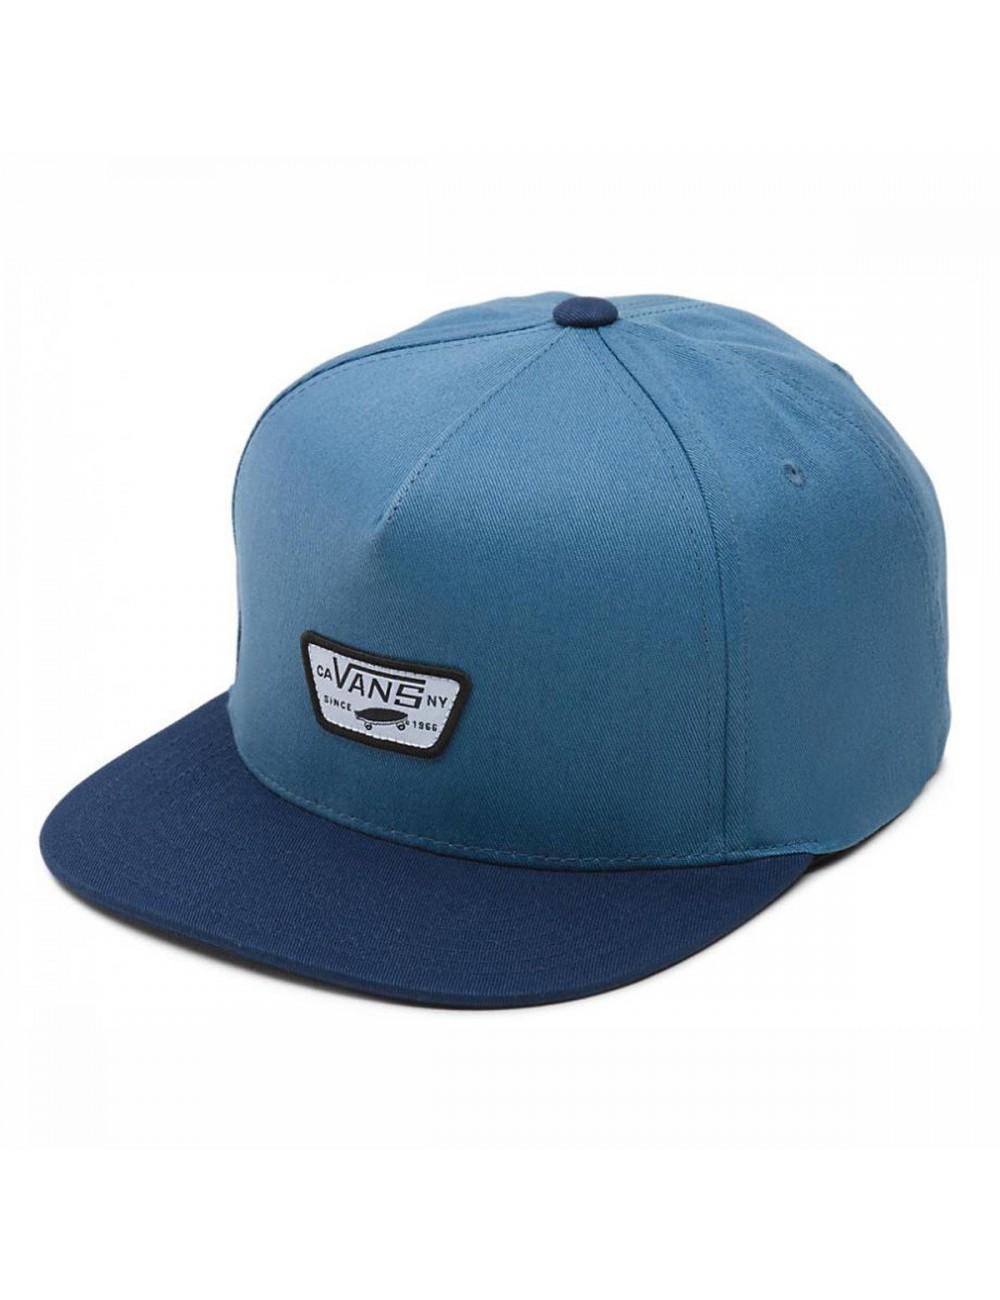 Vans Mini Full Patch Cap - Copen Blue_11470